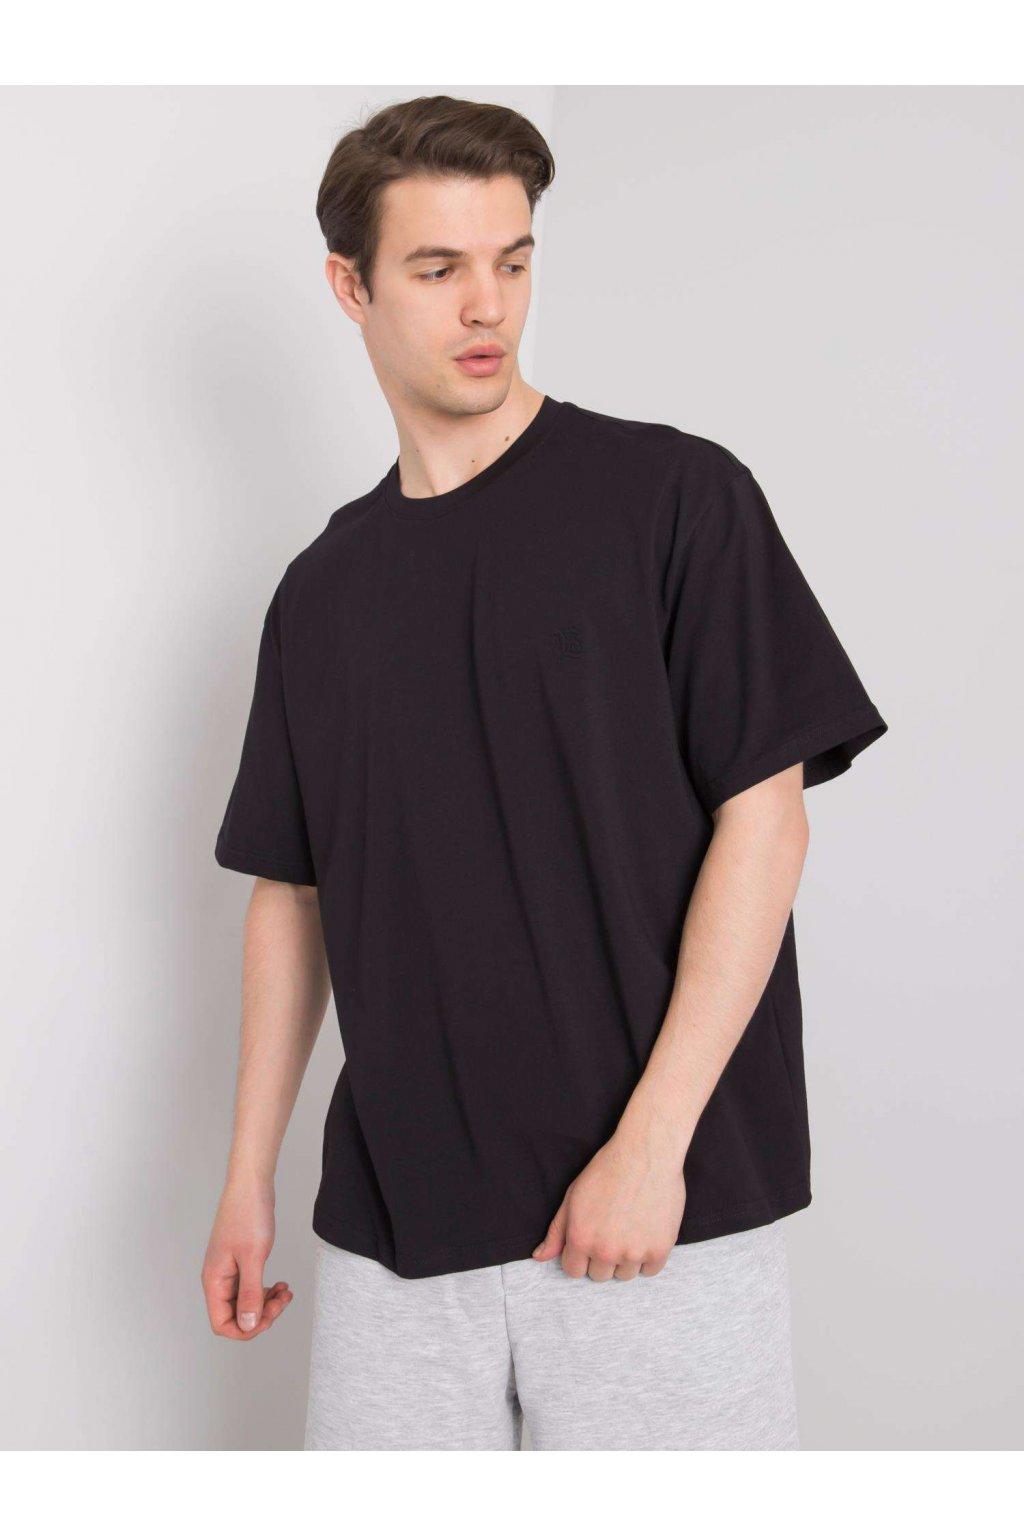 Pánske tričko t-shirt kód TSKK-Y21-0000229